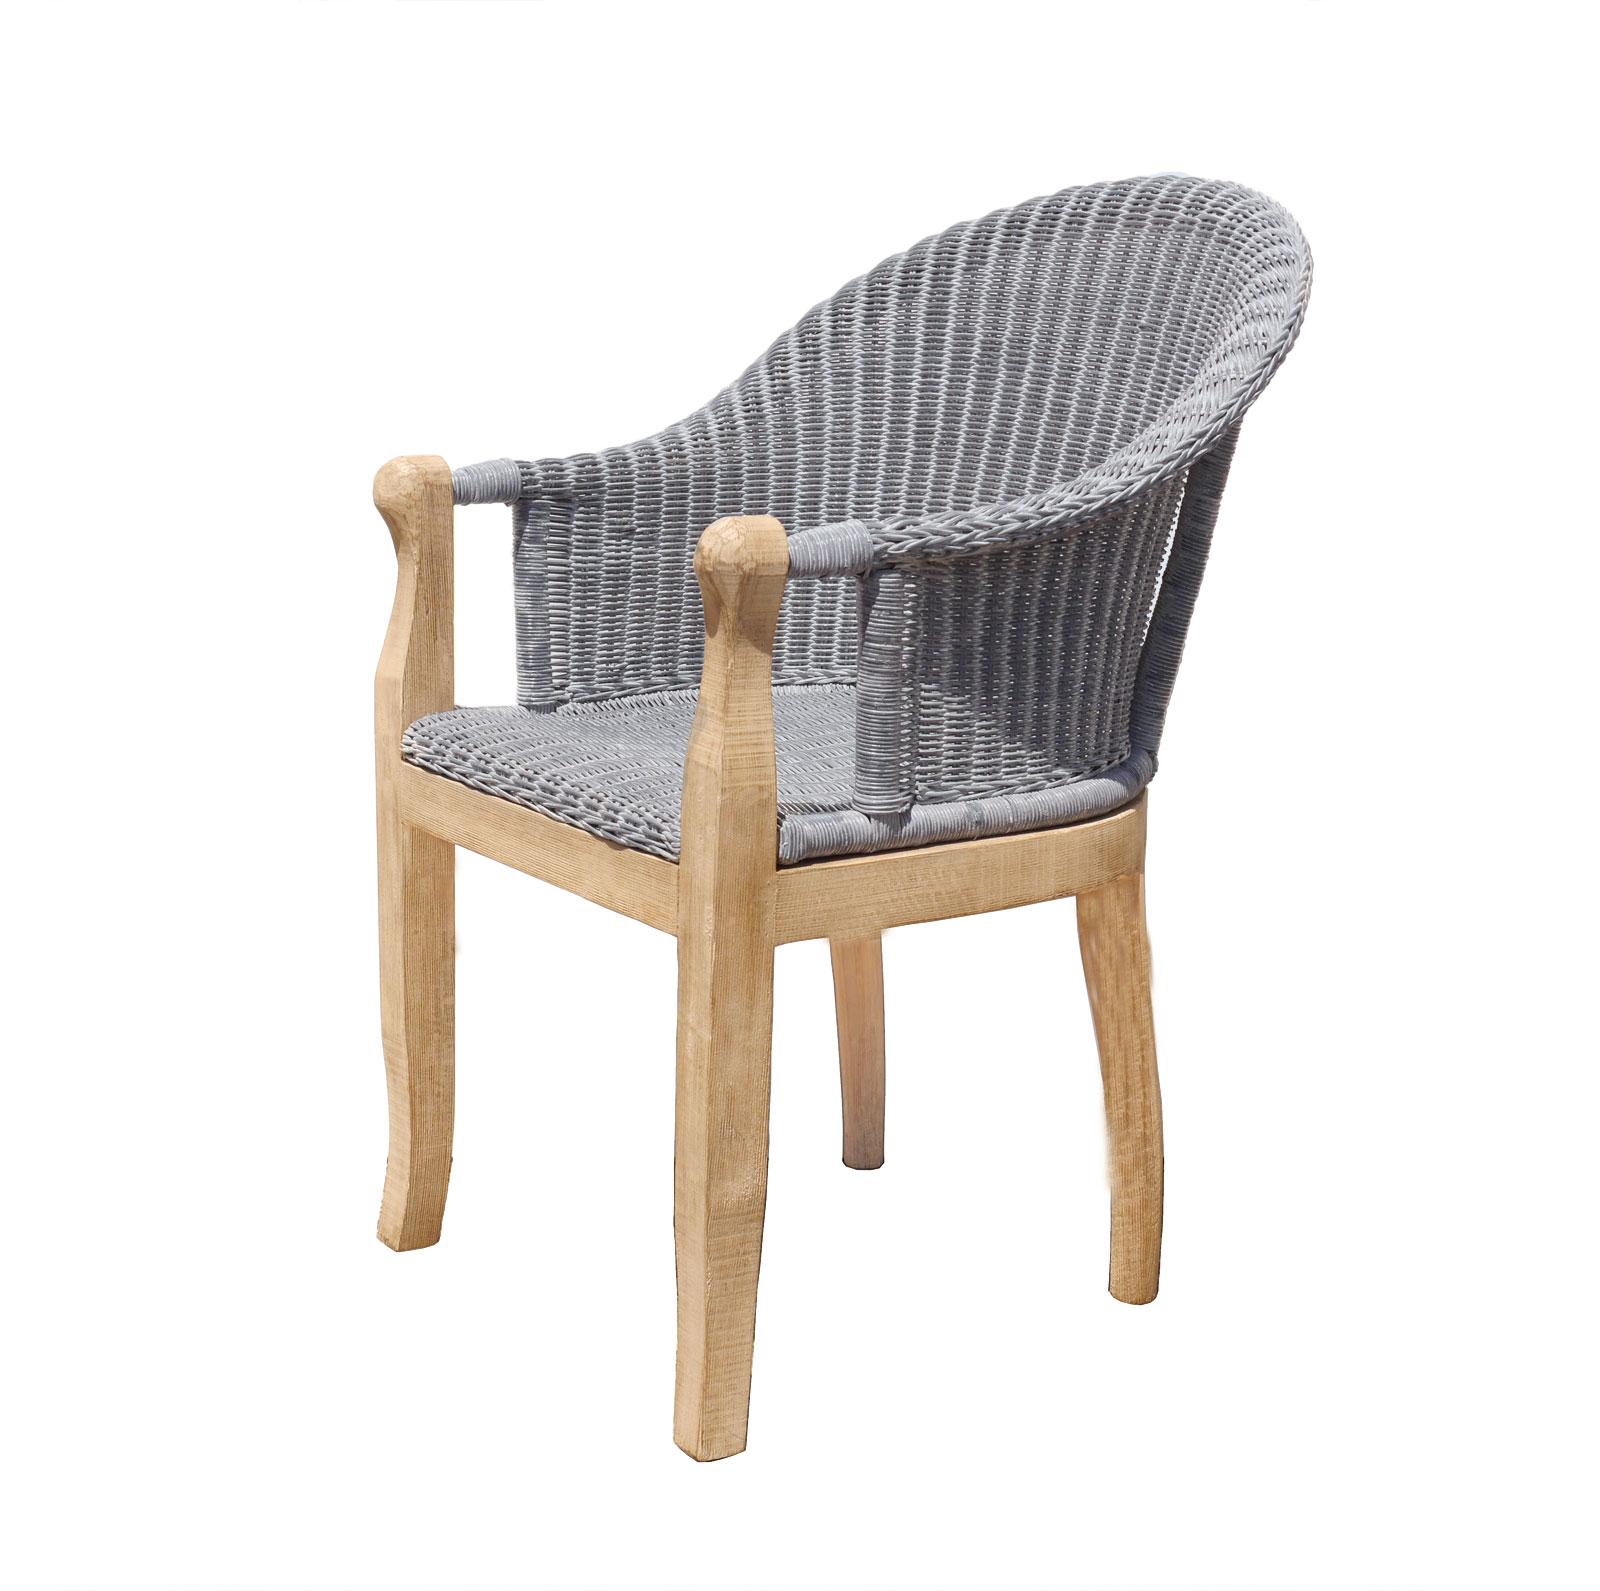 SAM® Esszimmer Stuhl Rattan grau Cobra mit Armlehnen